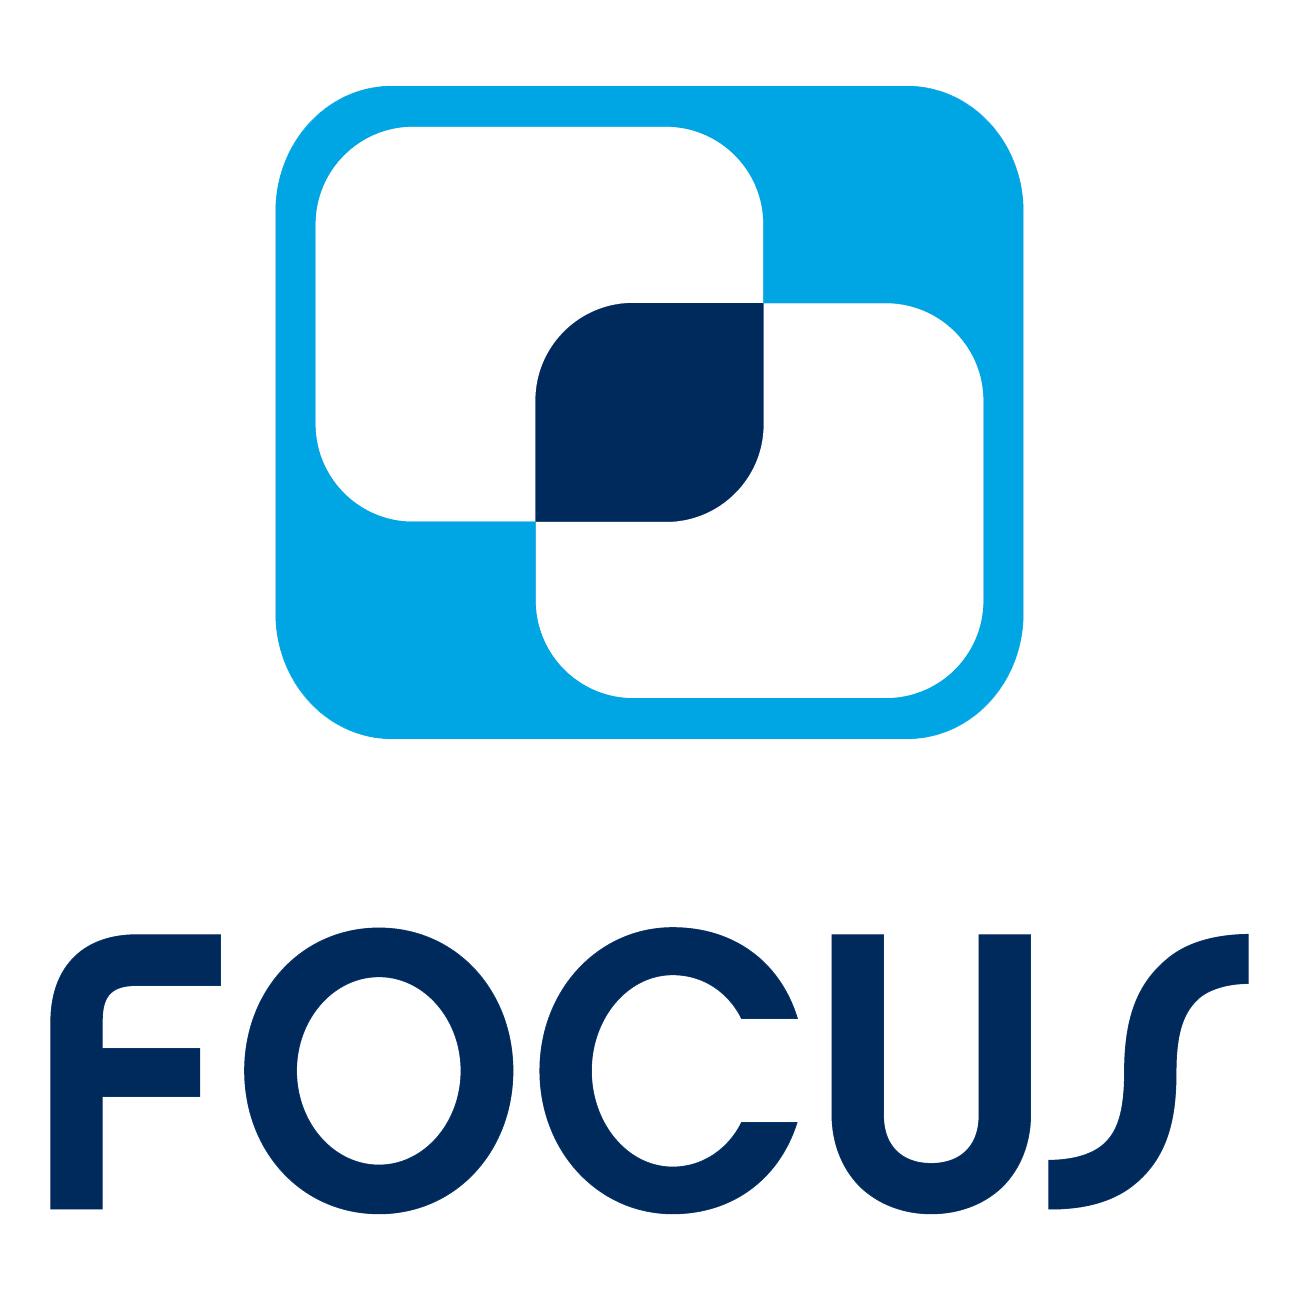 File:Focus logo.png.